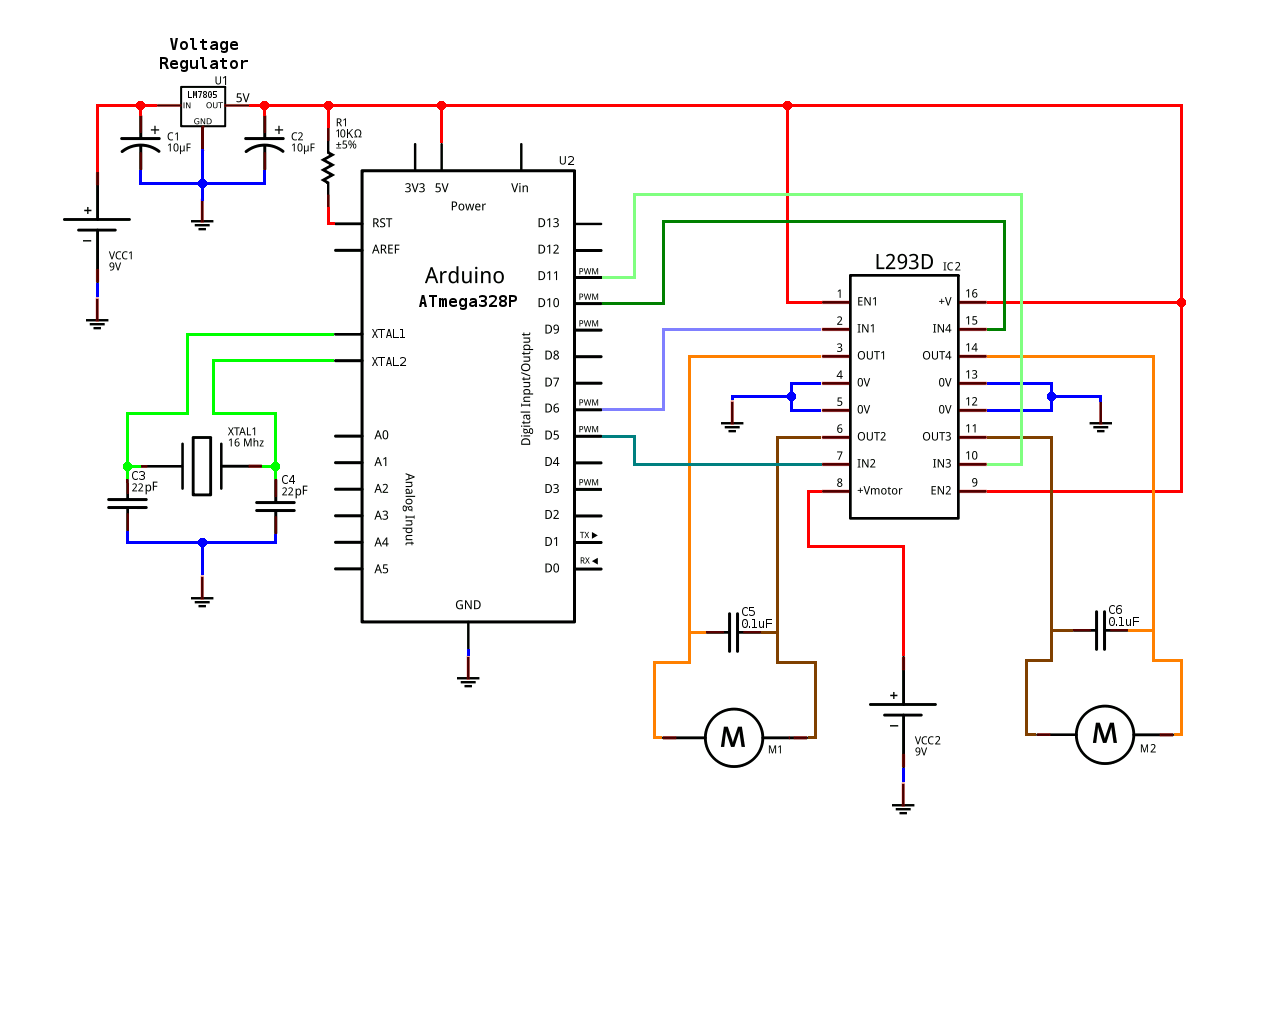 bipolar stepper motor driver circuit using uln2003